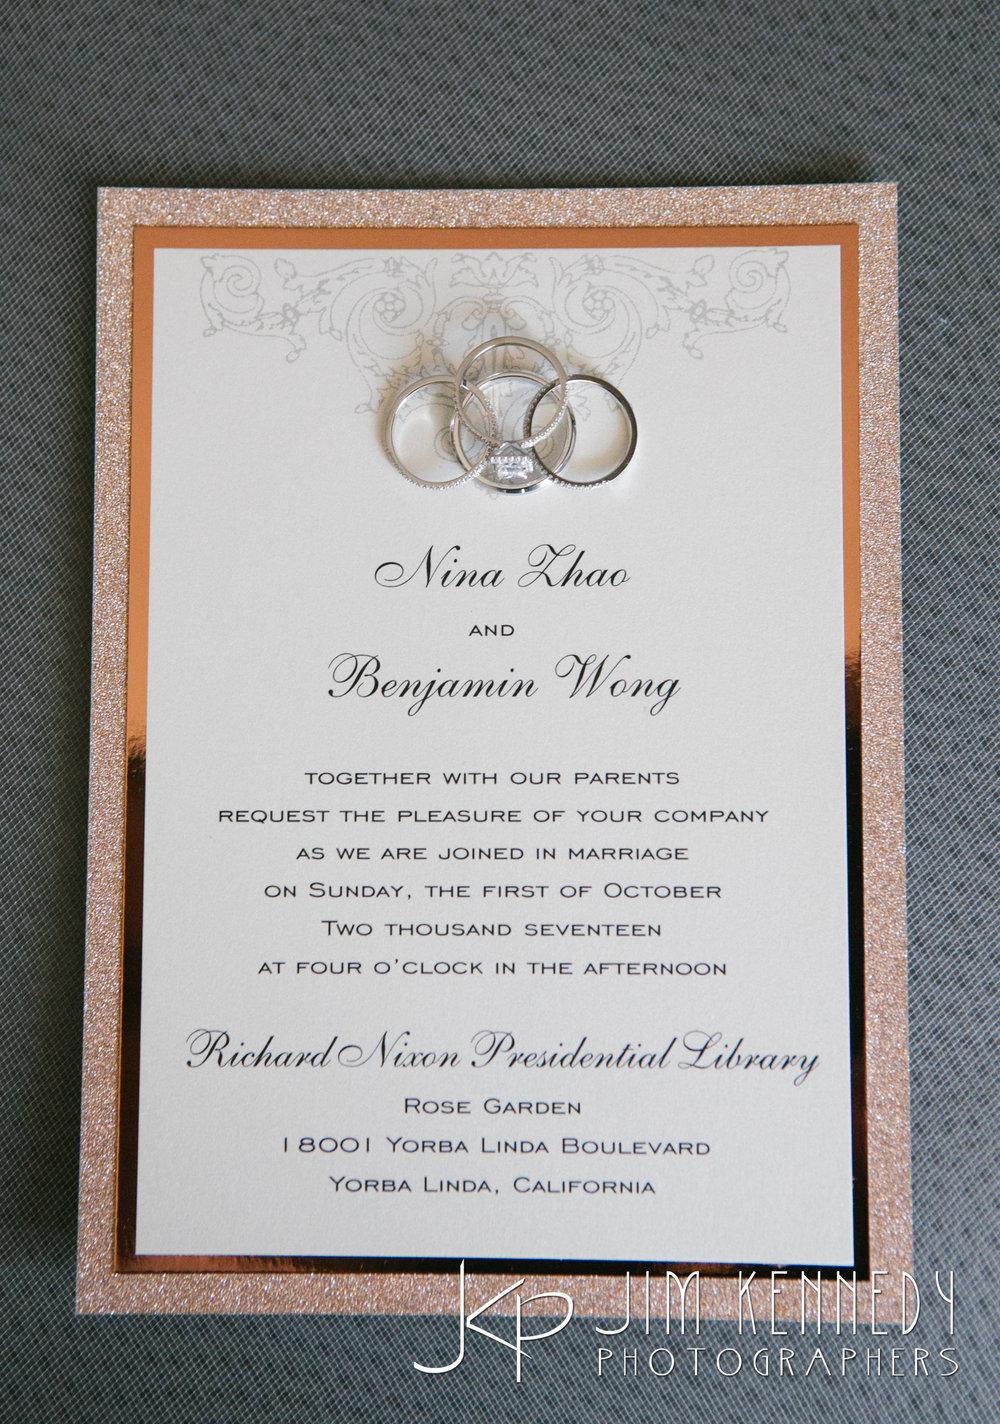 nixon-library-wedding-004.JPG